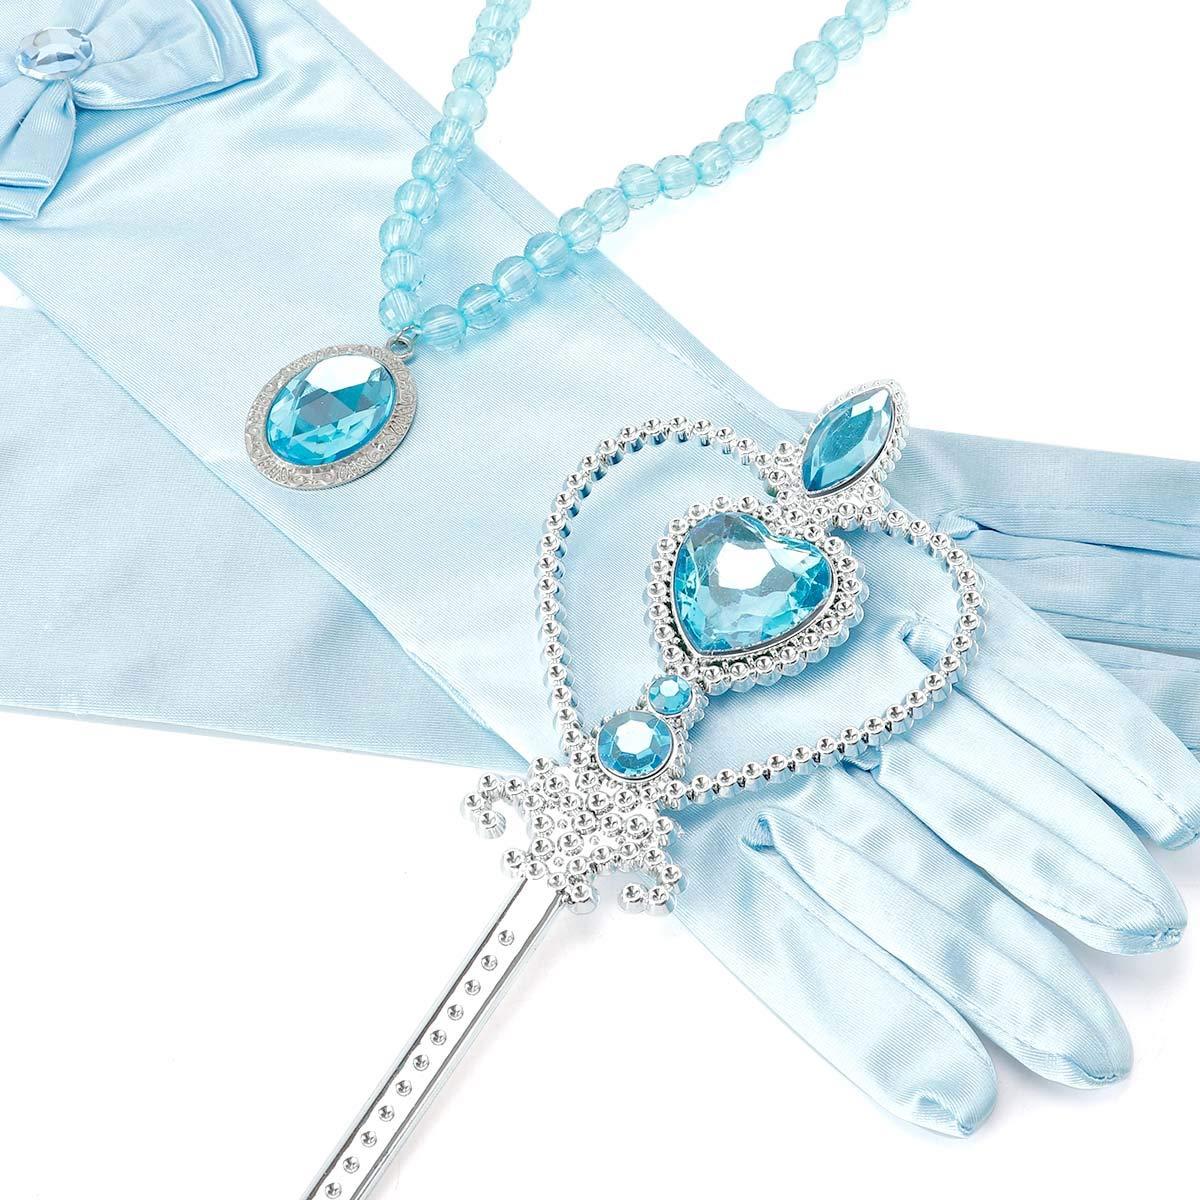 loel Princess Inspired Girls Snow Queen Party Costume Dress